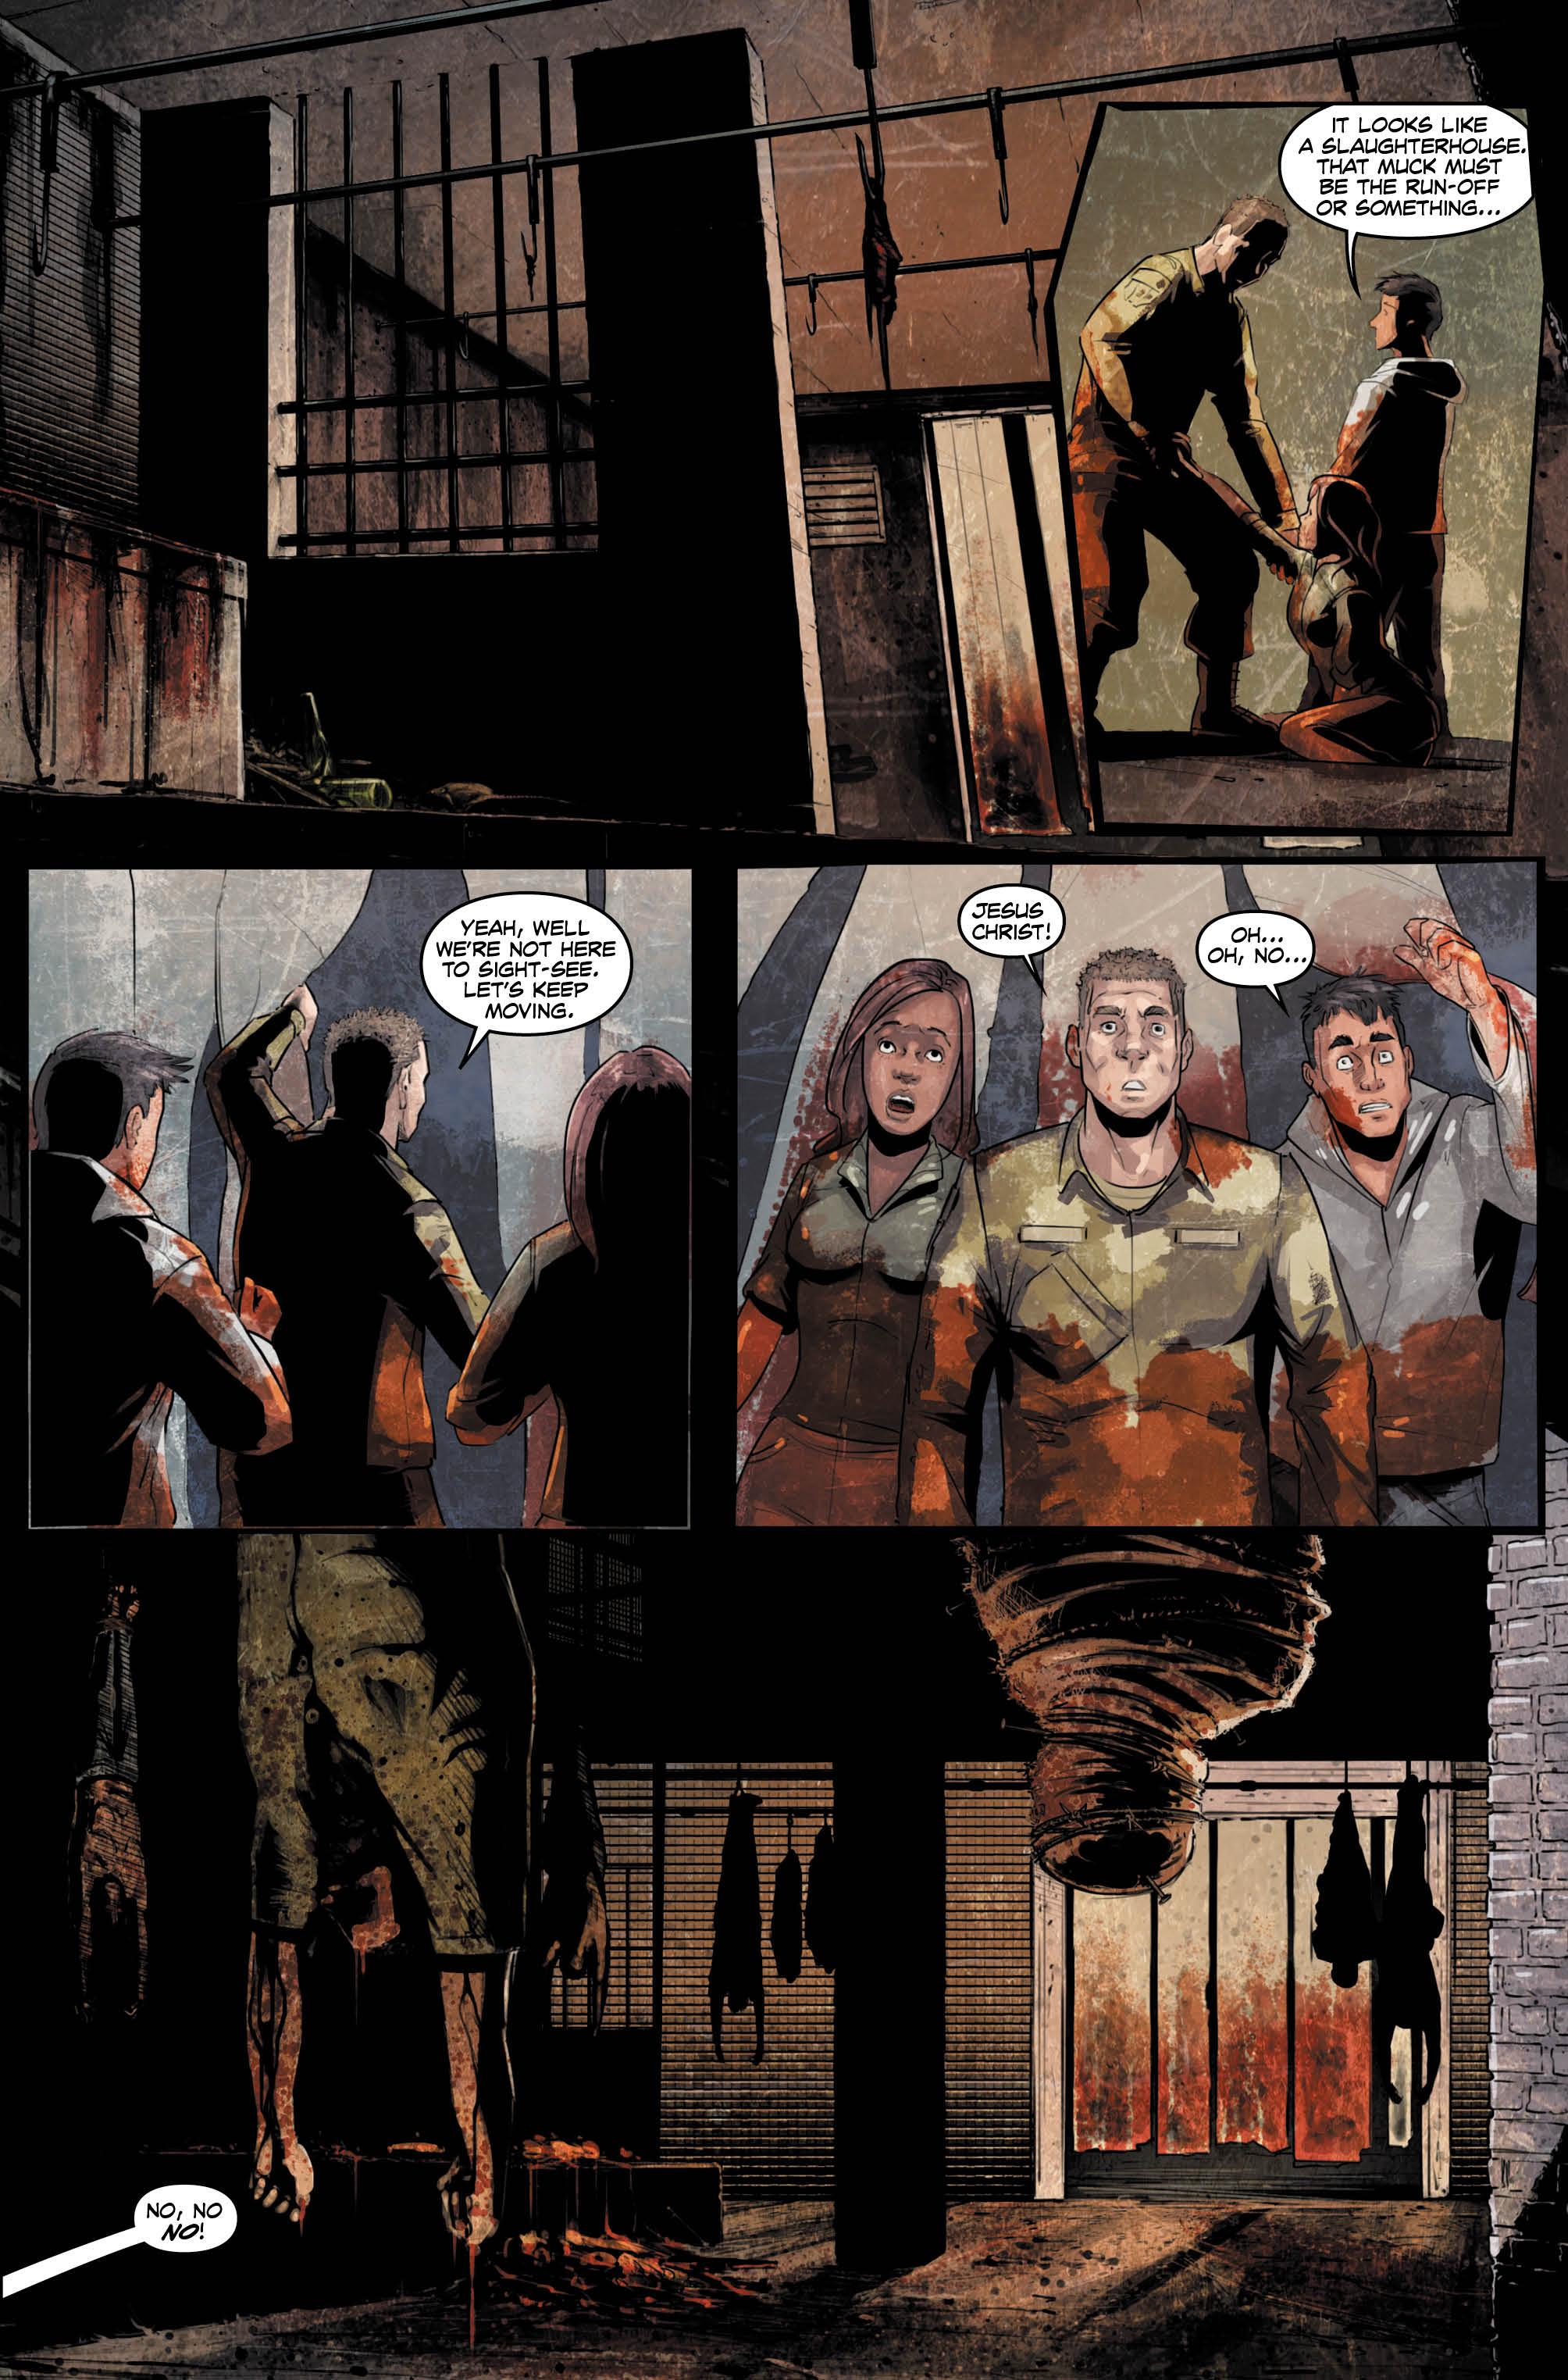 Archie comics archie comics sneak peek of the week major spoilers -  Evil Within 3 Preview 3 Via Titan Comics